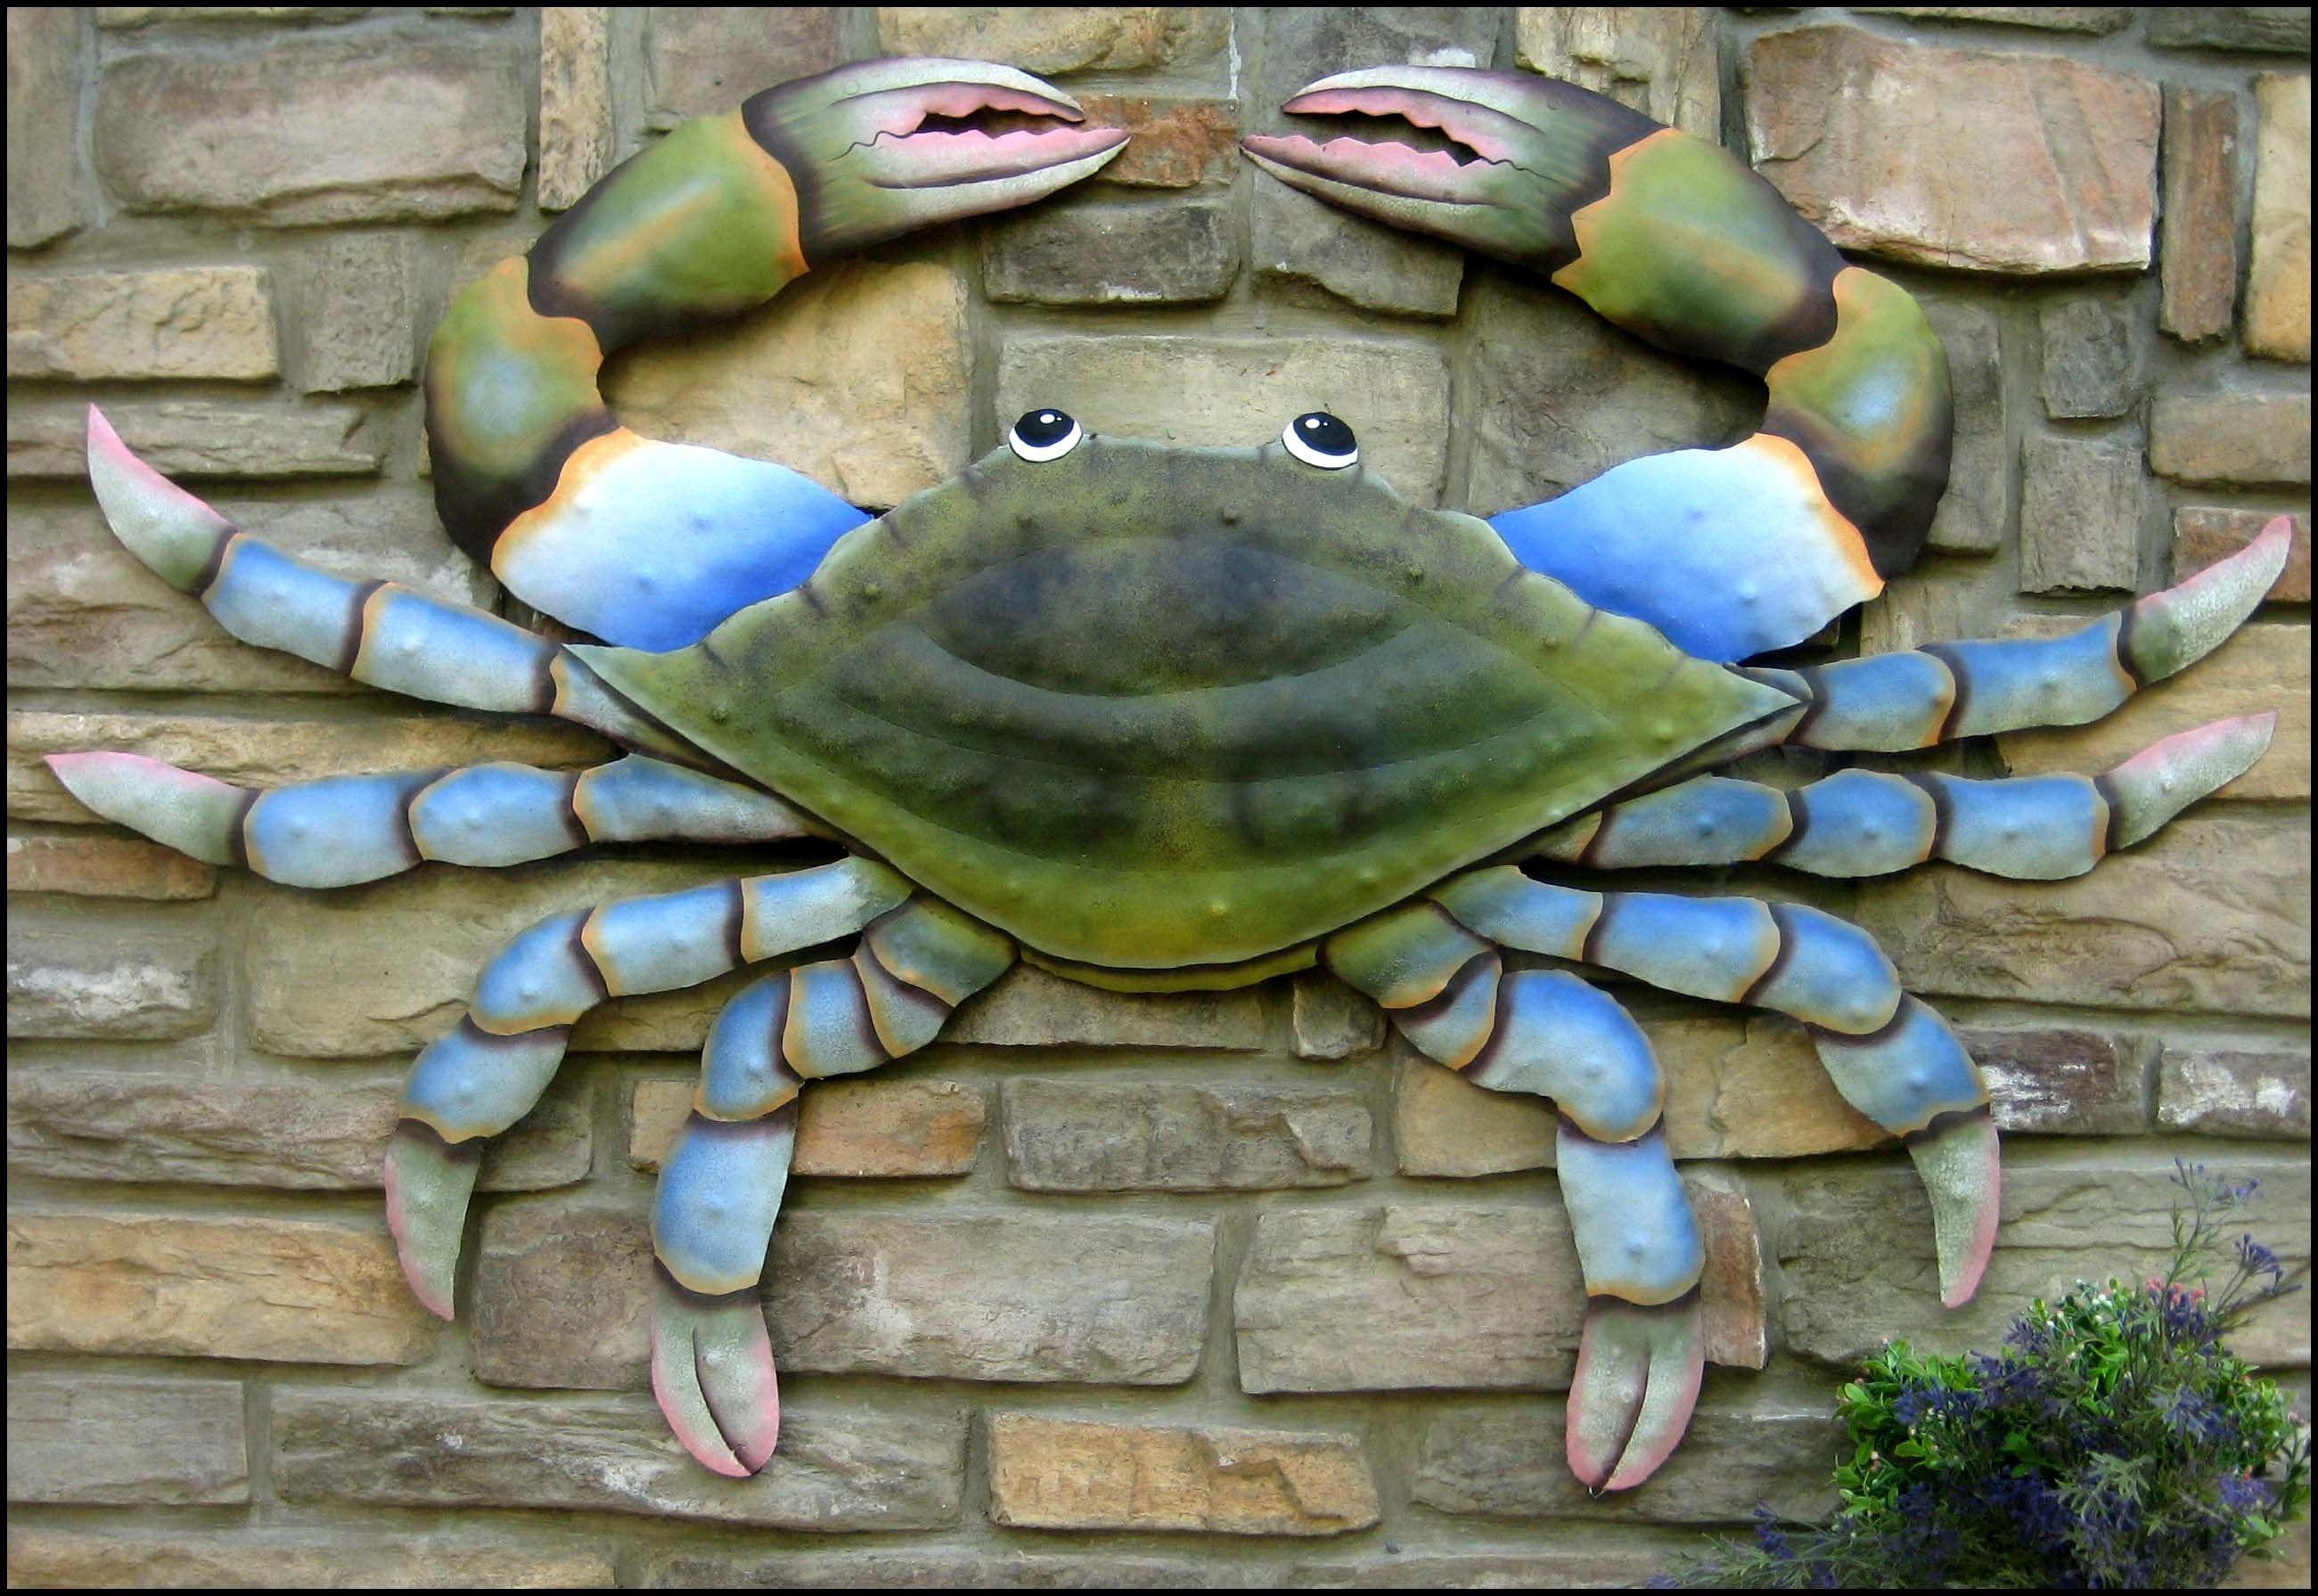 Crab Wall Hanging Coastal Decor Island Decor Garden Art Etsy Outdoor Metal Art Coastal Wall Decor Metal Crab